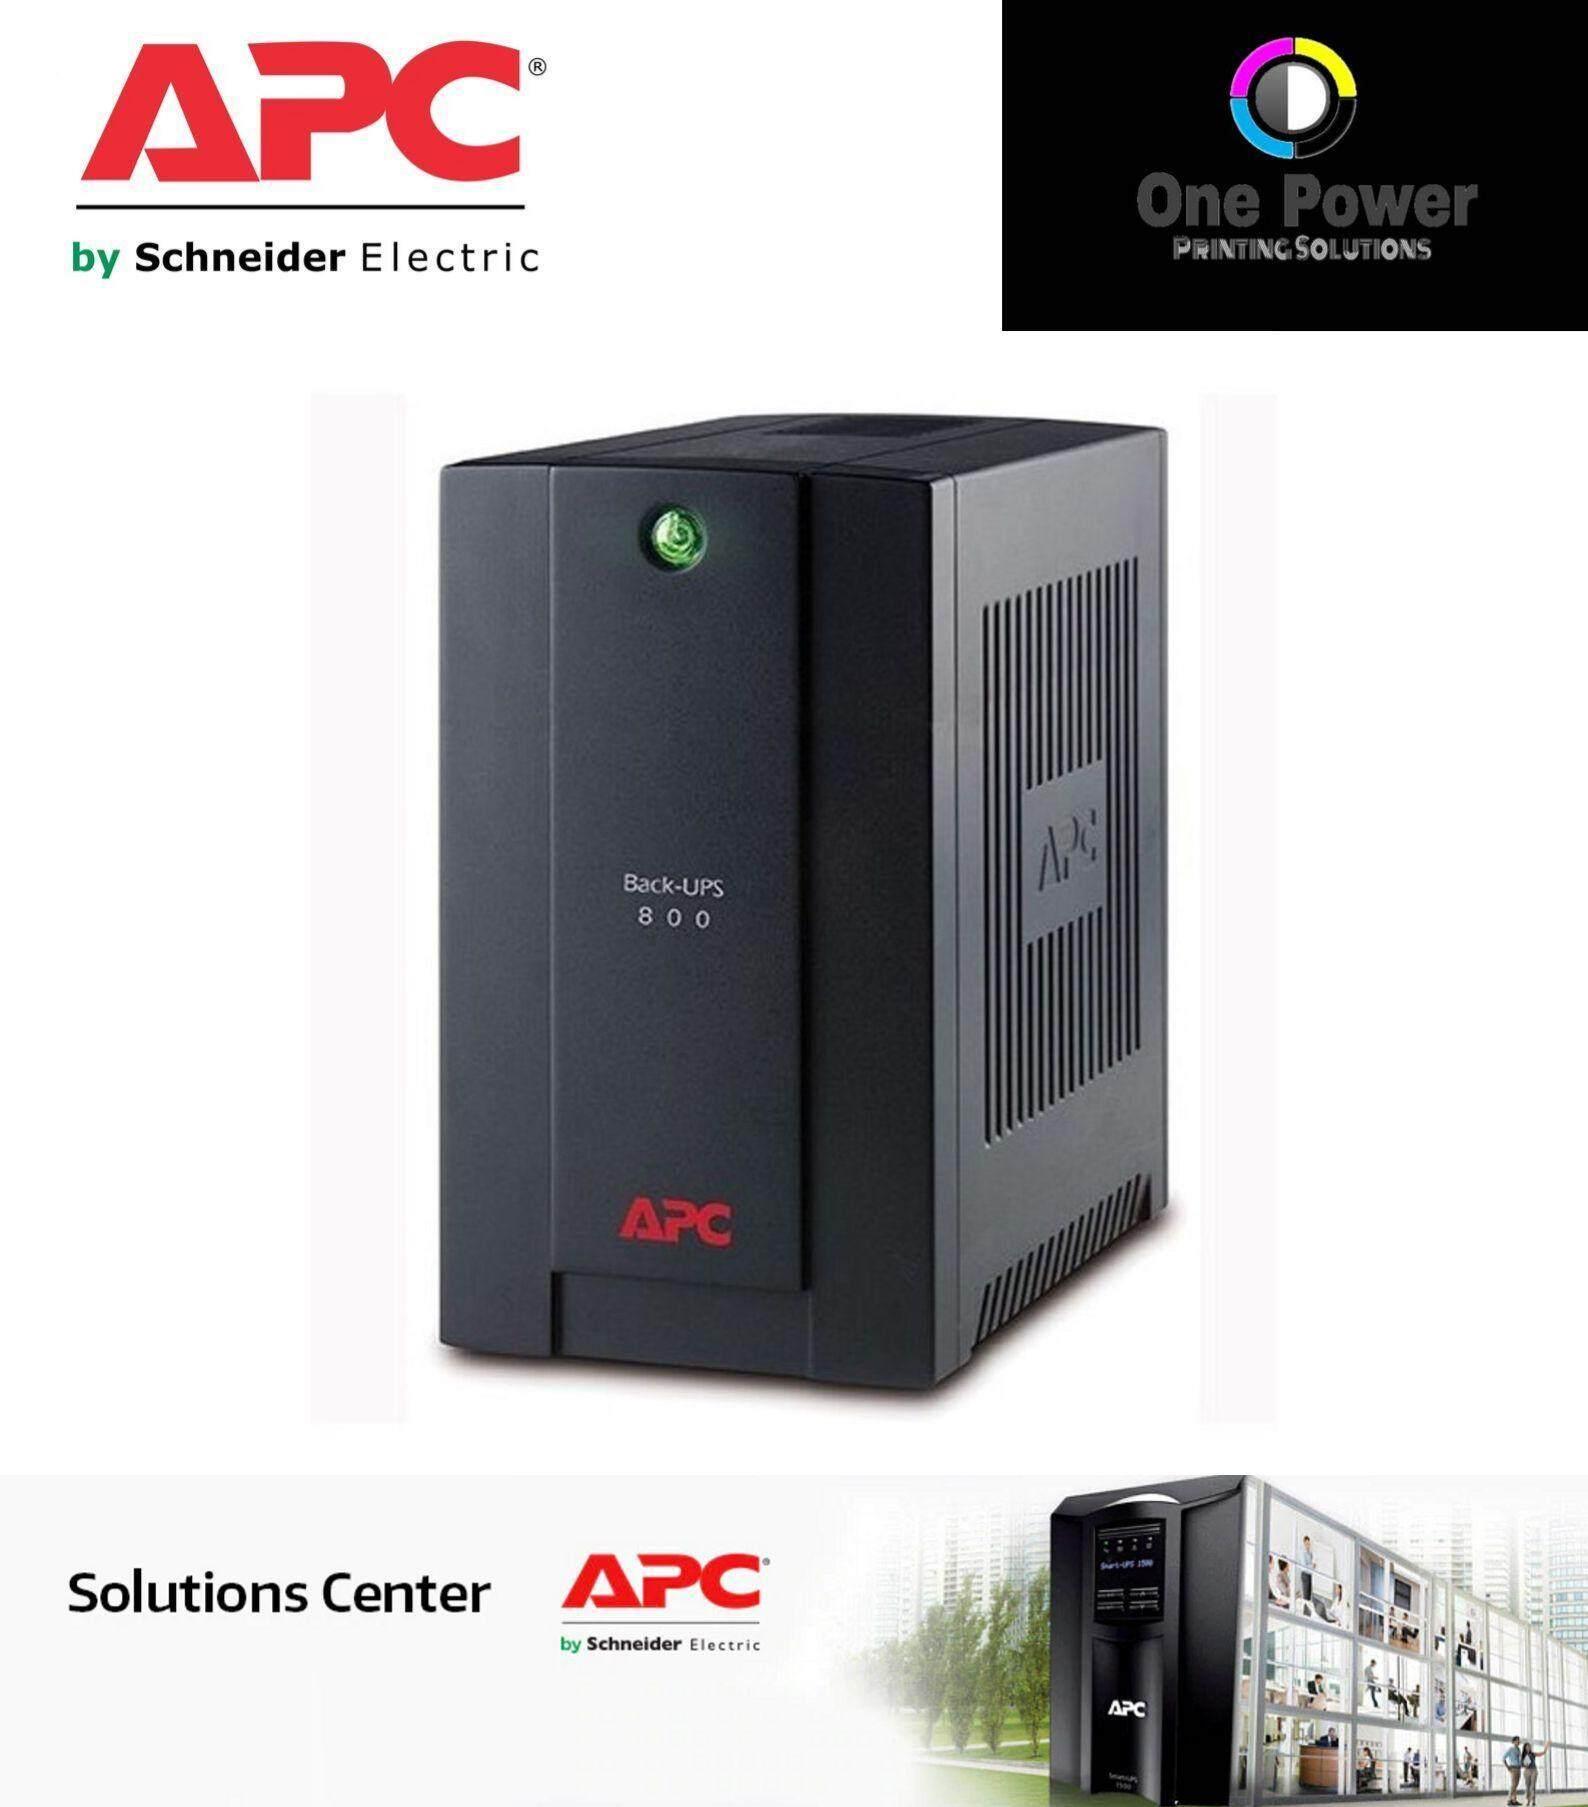 APC Back-Ups 800VA BX800LI-MS AVR Backup Battery & Surge Protector for Computers with Universal & IEC Sockets